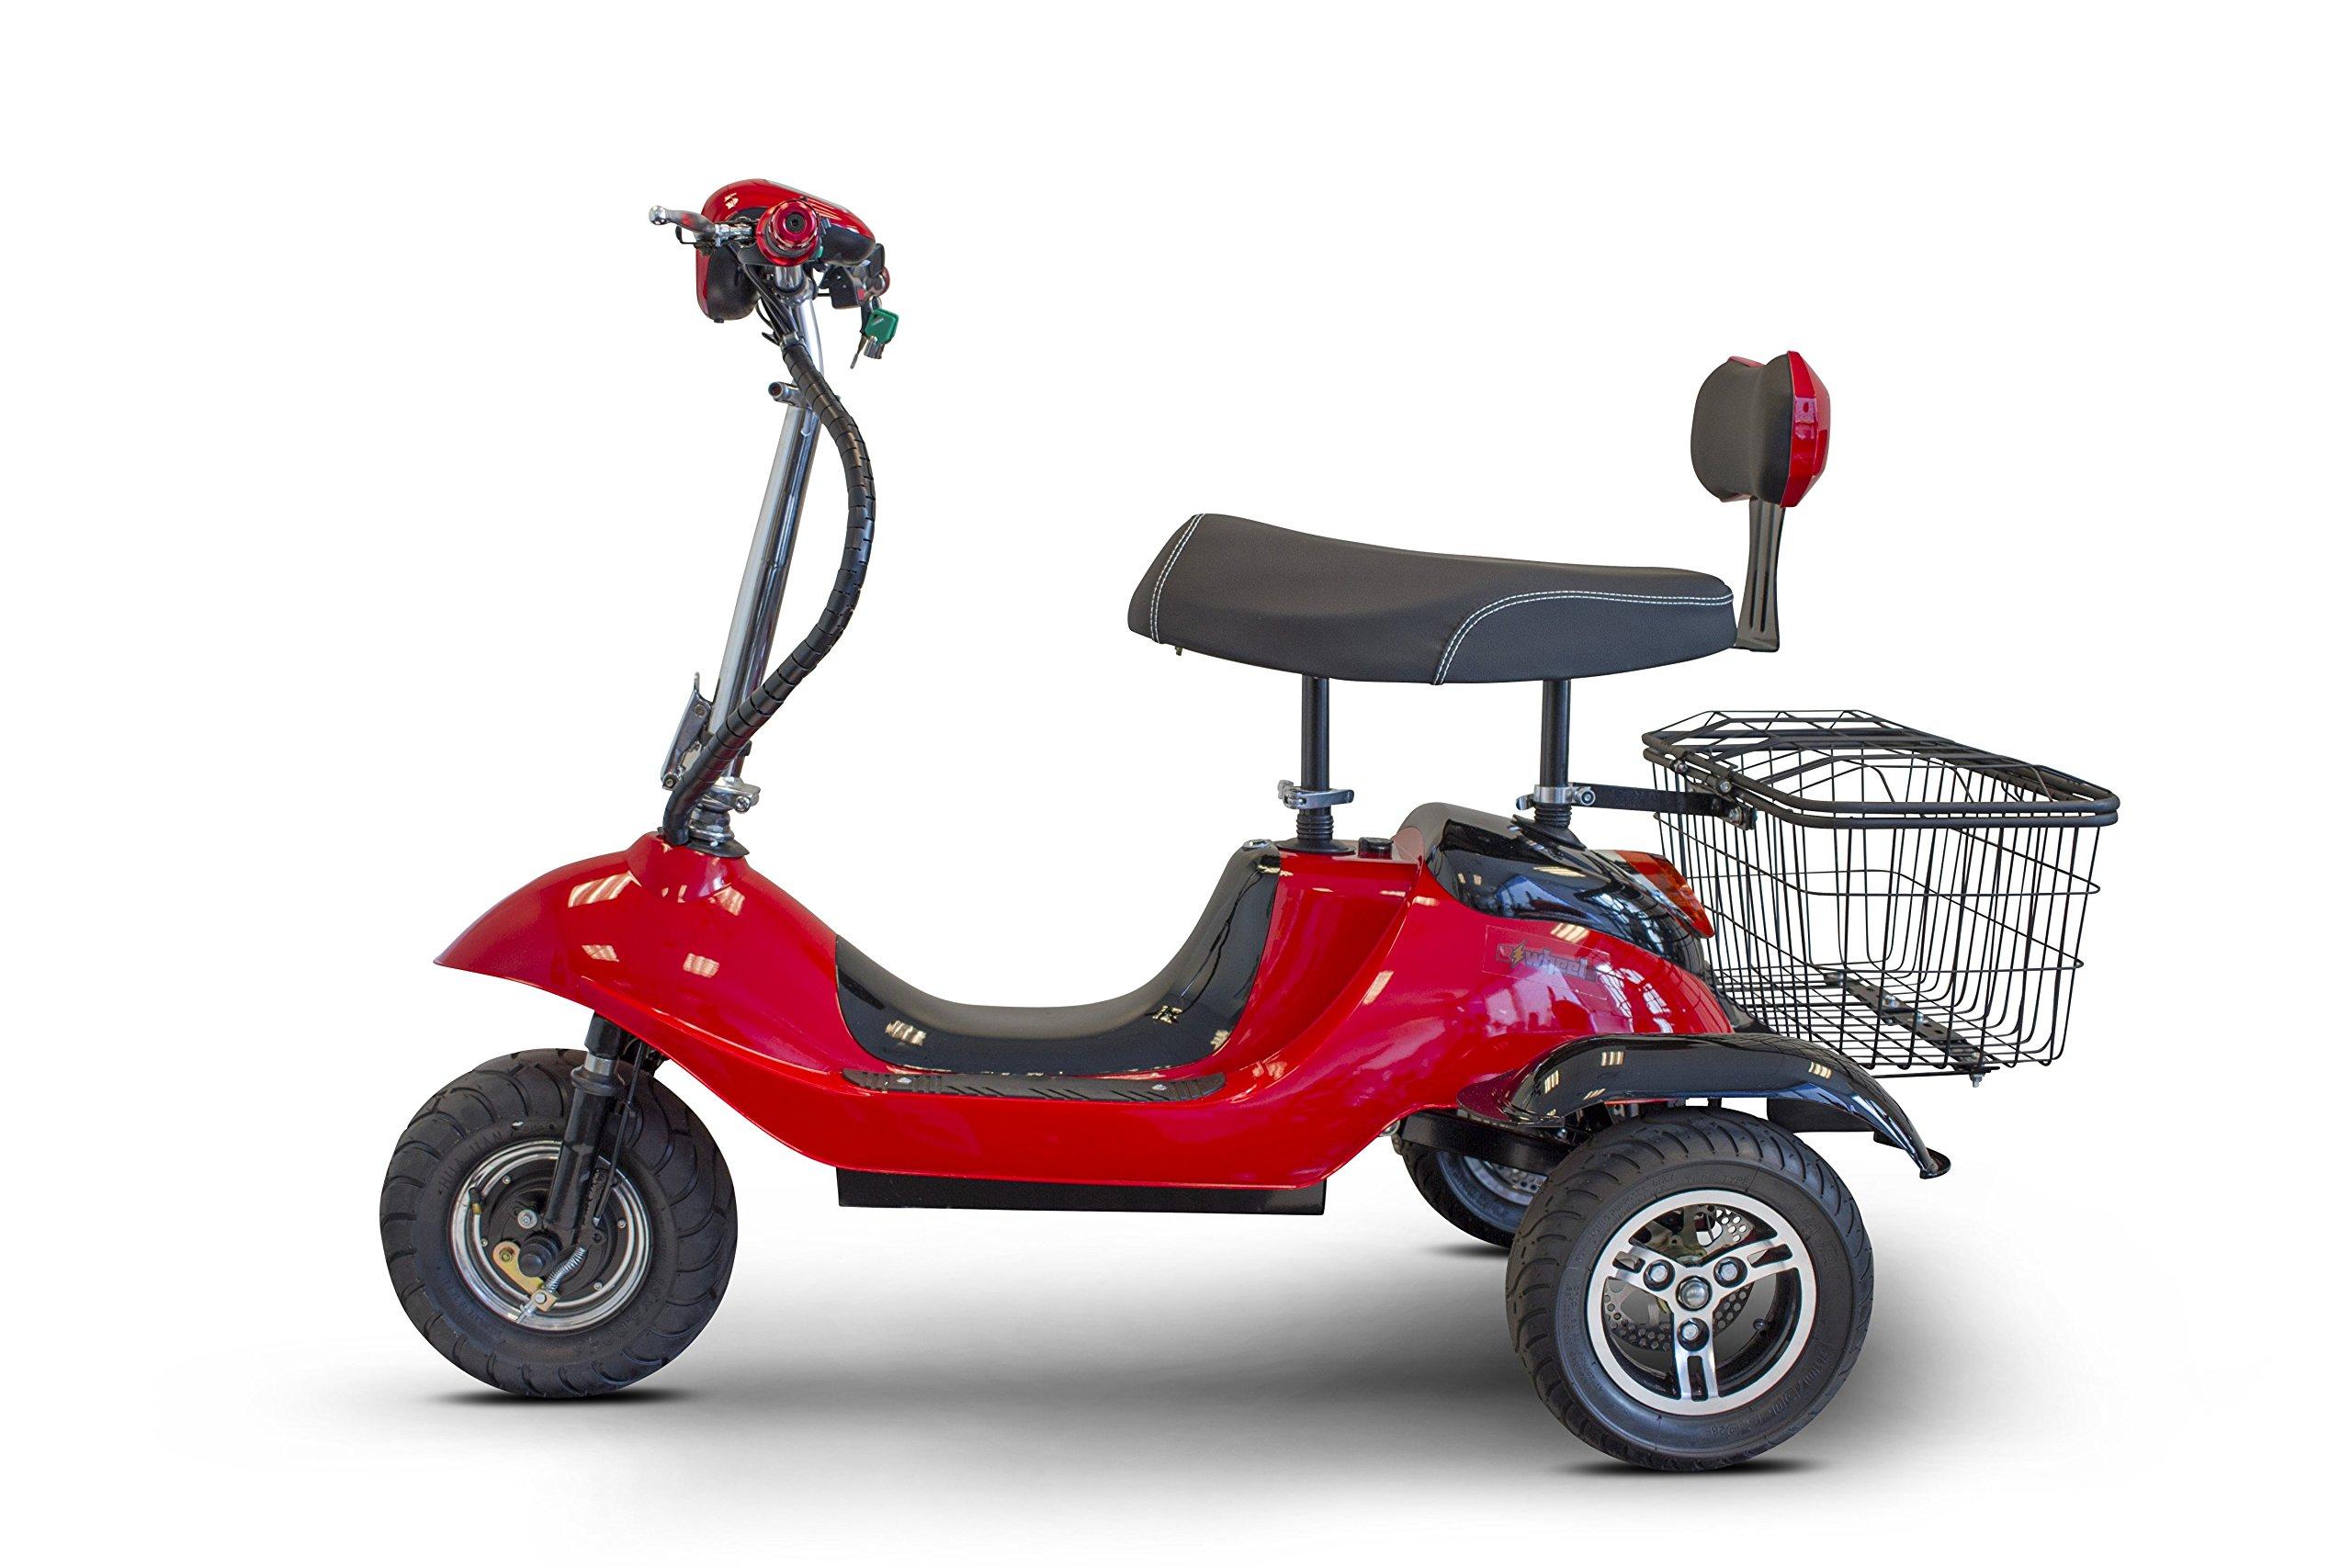 E-Wheels - EW-19 Sporty - 3-Wheel - Red - PHILLIPS POWER PACKAGE TM - $500 VALUE